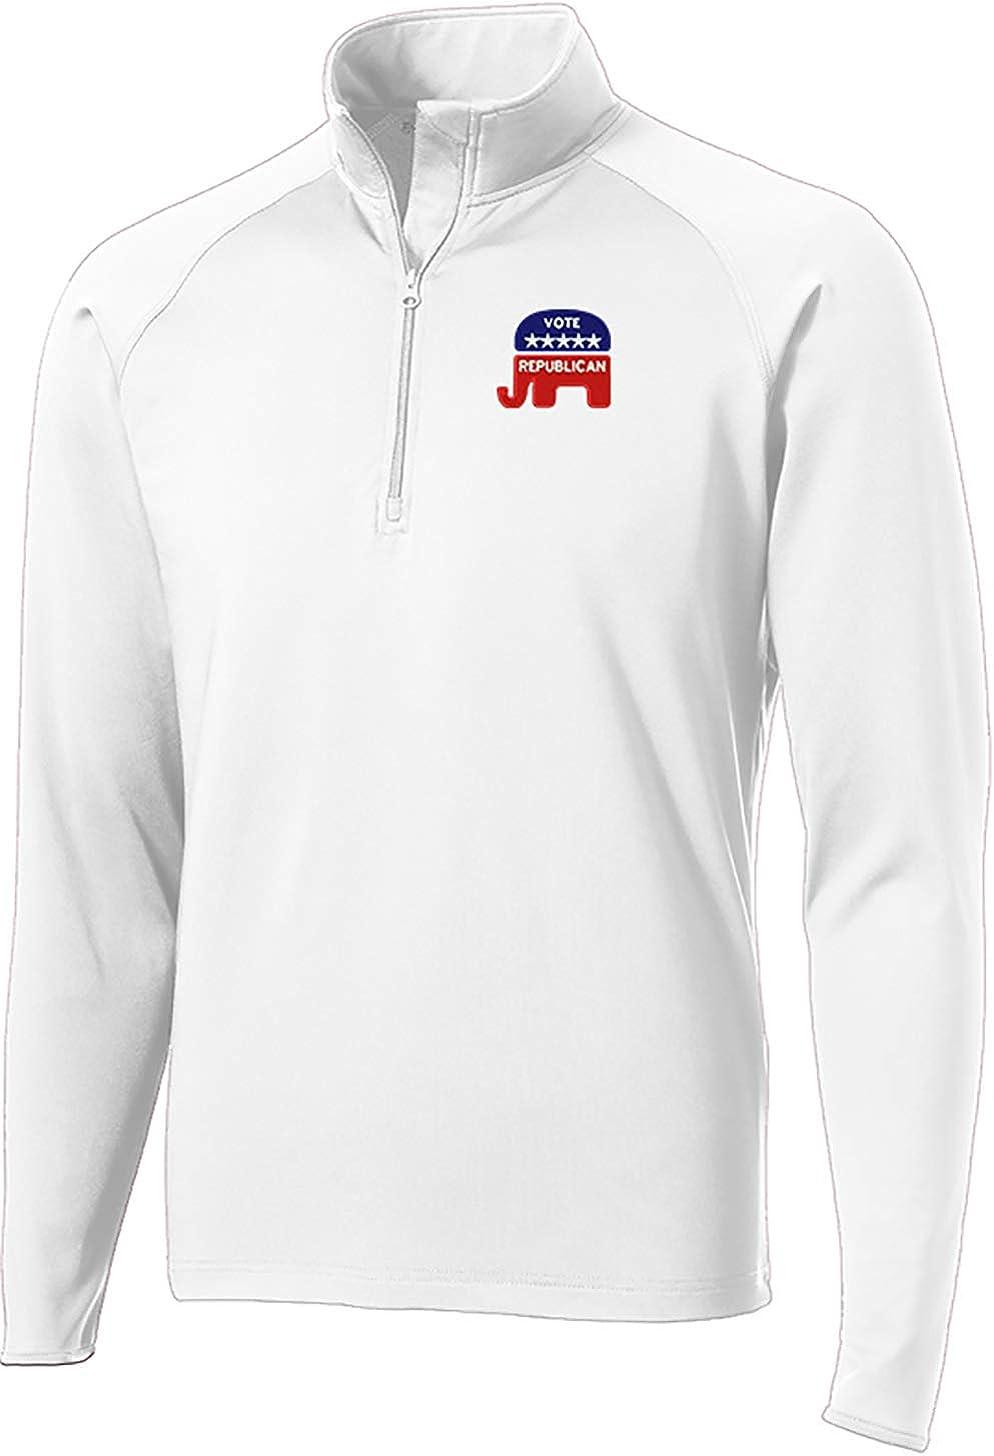 Peerless Vote Republican Trump 2020 Stretch 1/2-Zip Pullover ST850